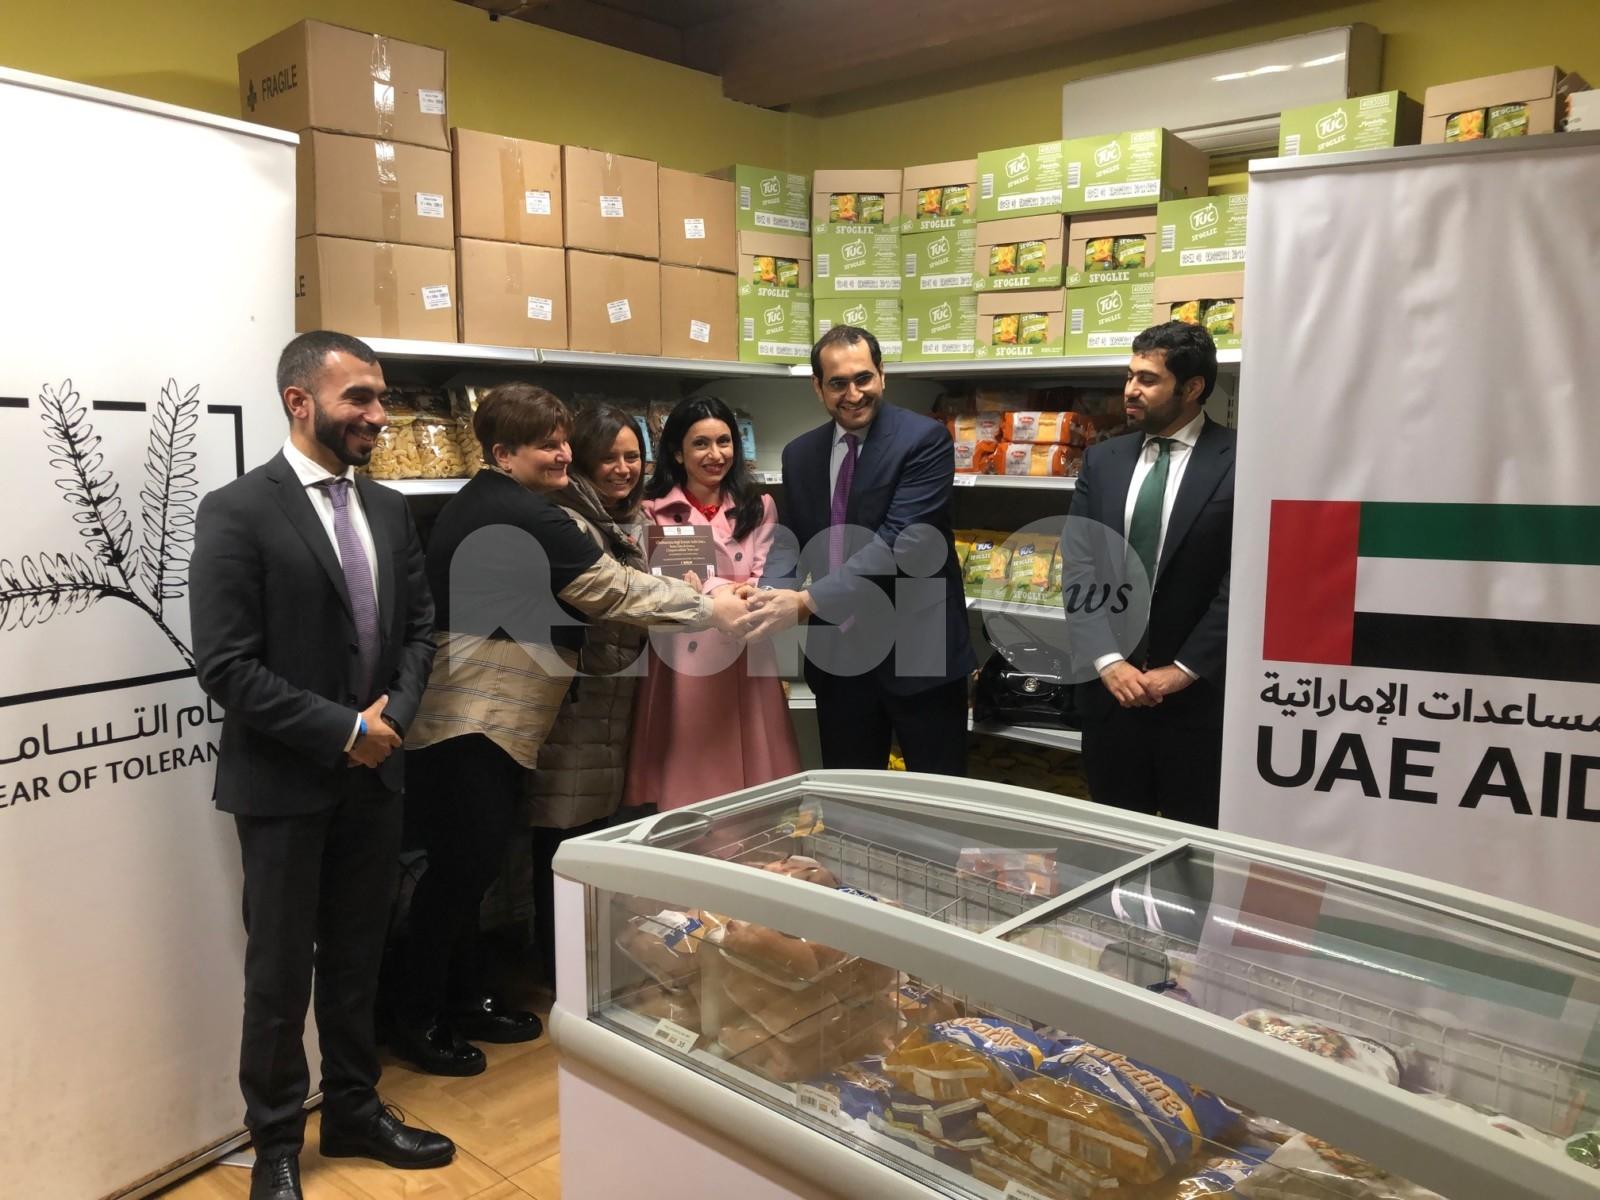 L'ambasciatore Obeid Al Shamsi in visita ad Assisi per due giorni - Assisi News